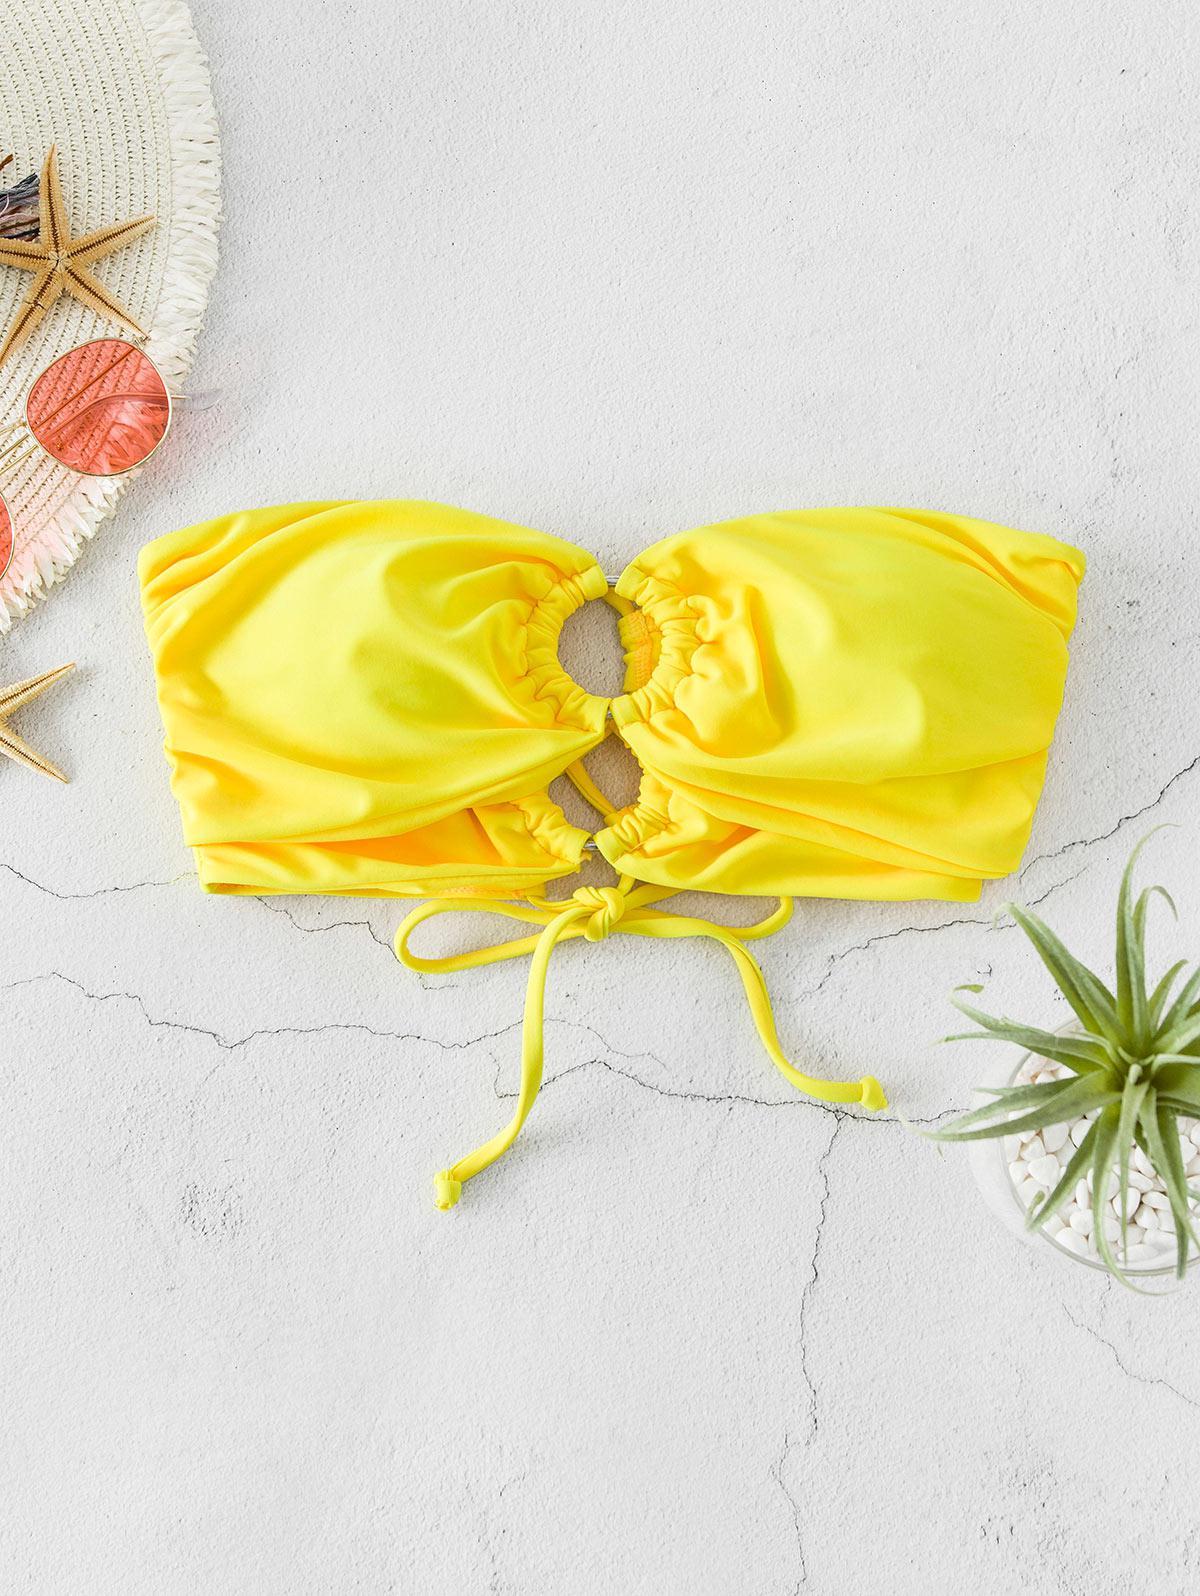 ZAFUL O-ring Lace Up Ruched Bandeau Bikini Top фото